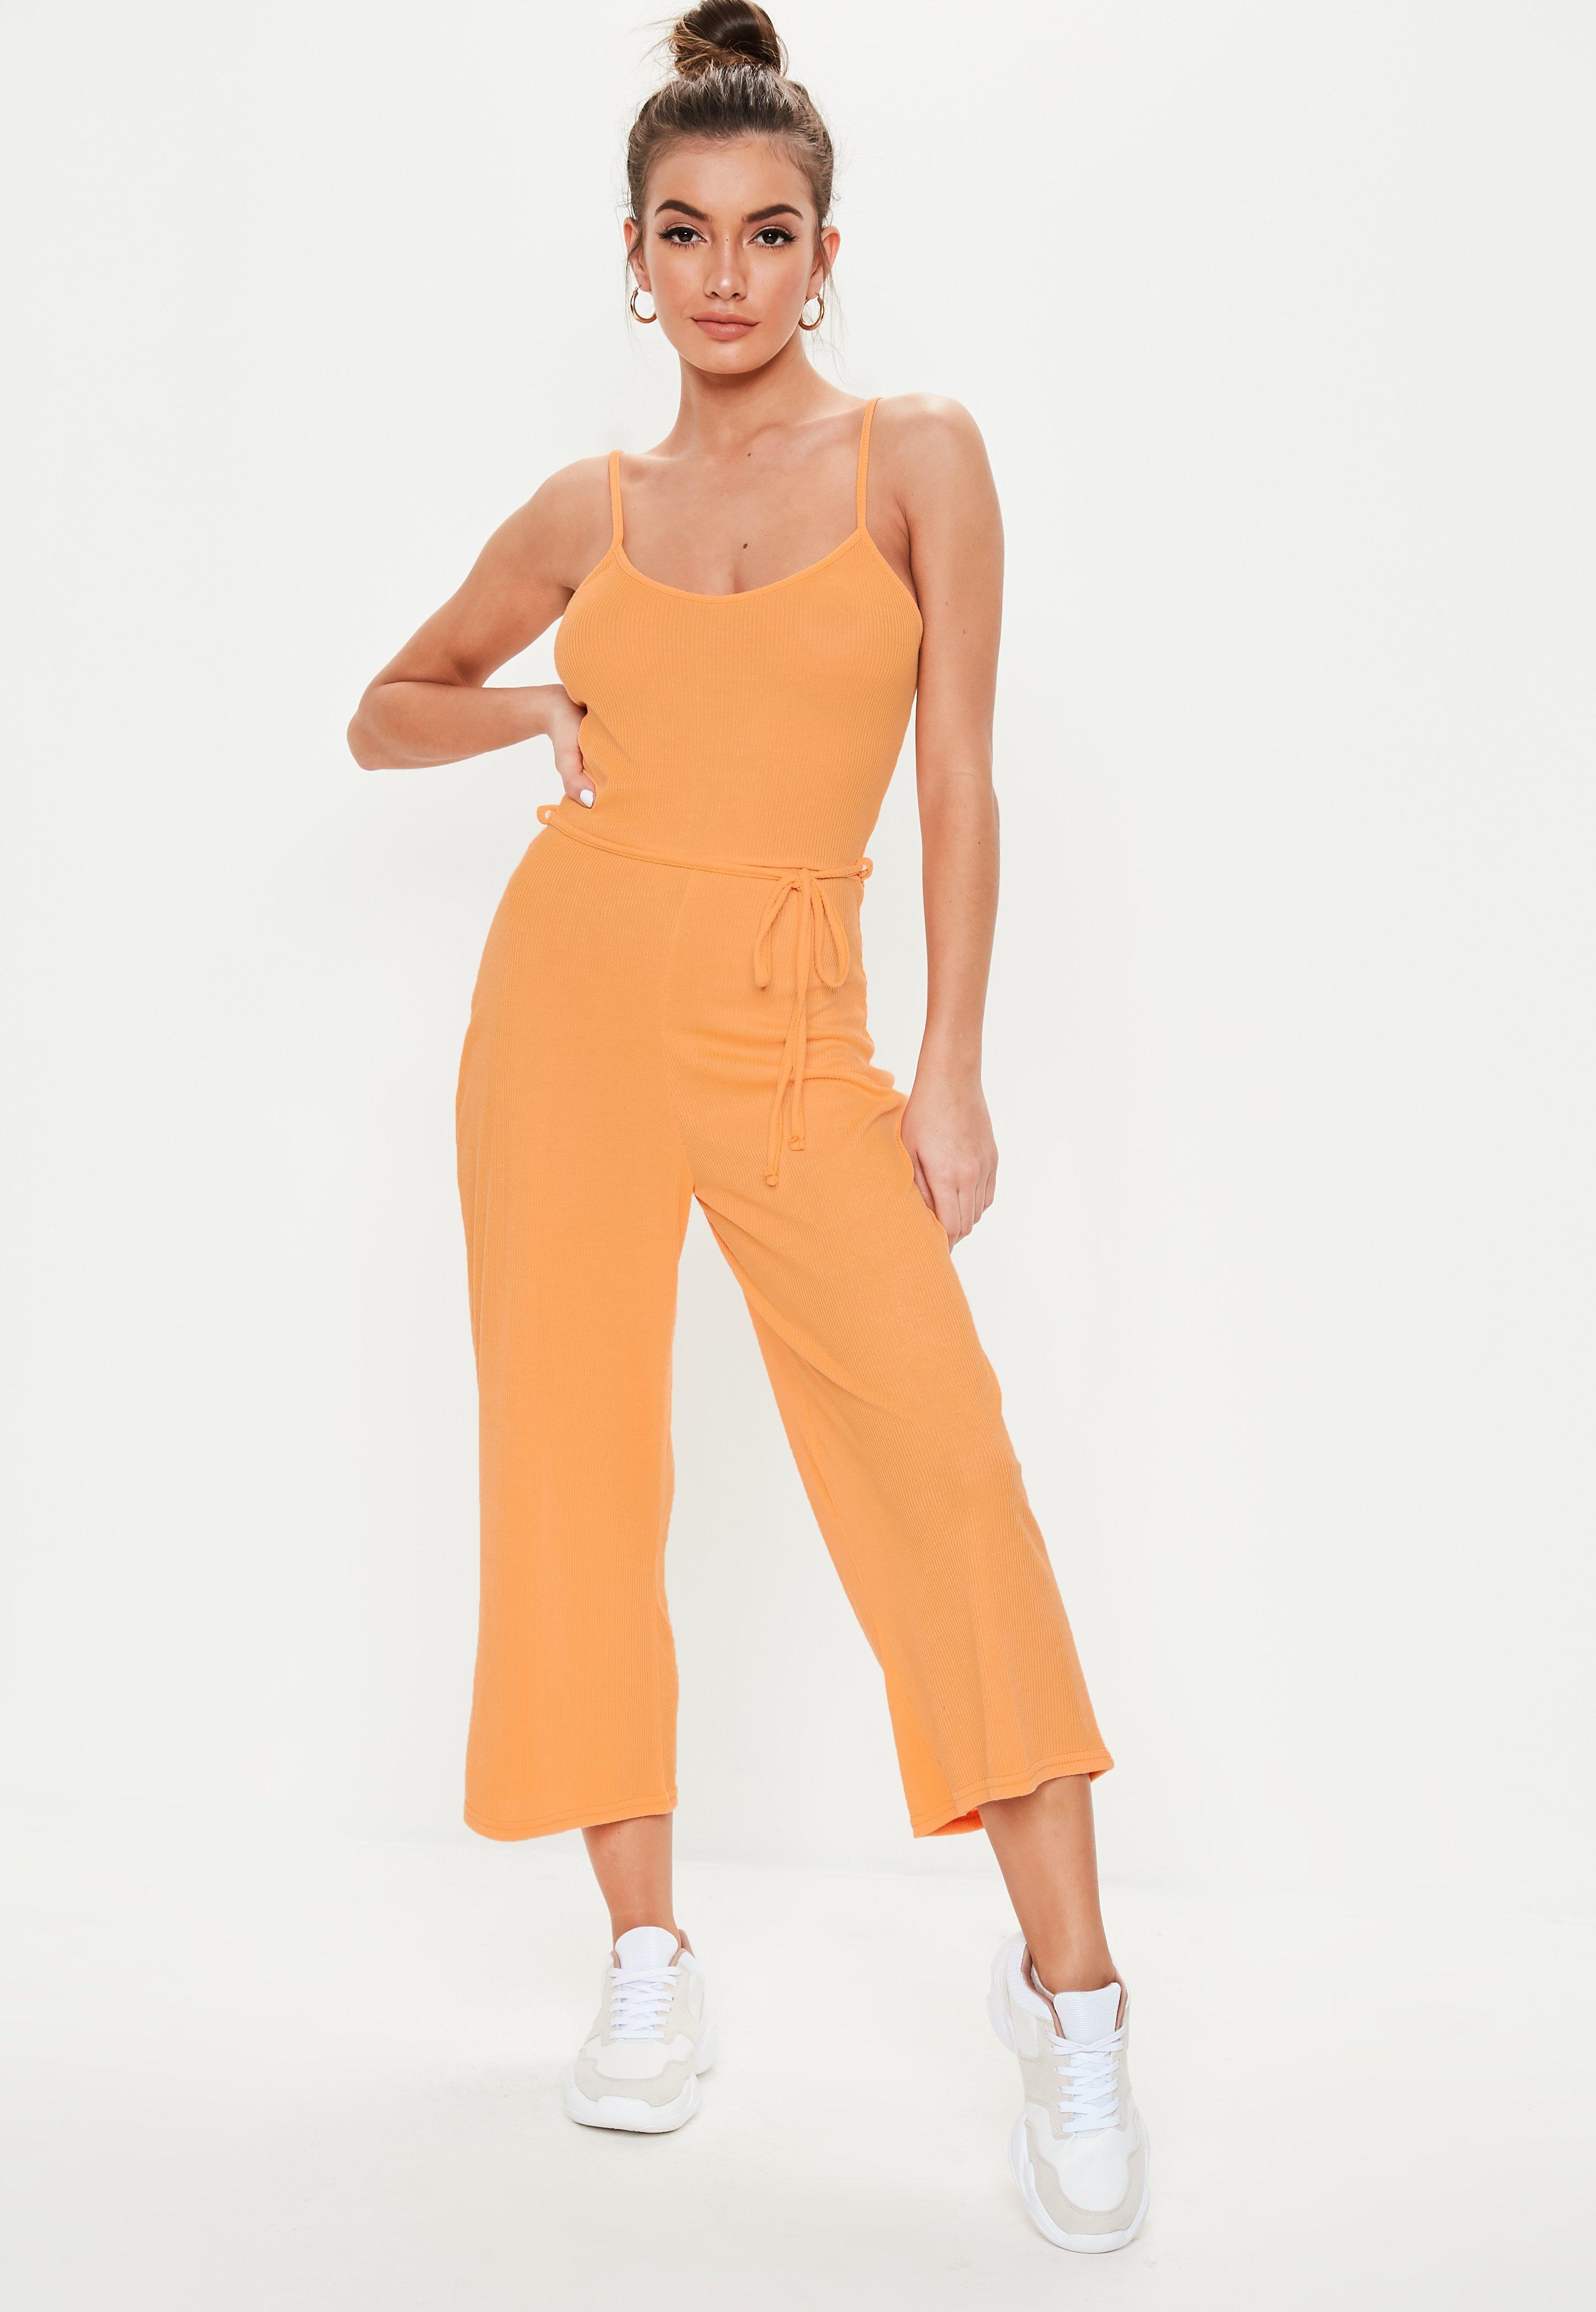 b560be7e7f5c Culotte Jumpsuits - Women s Cropped Jumpsuits